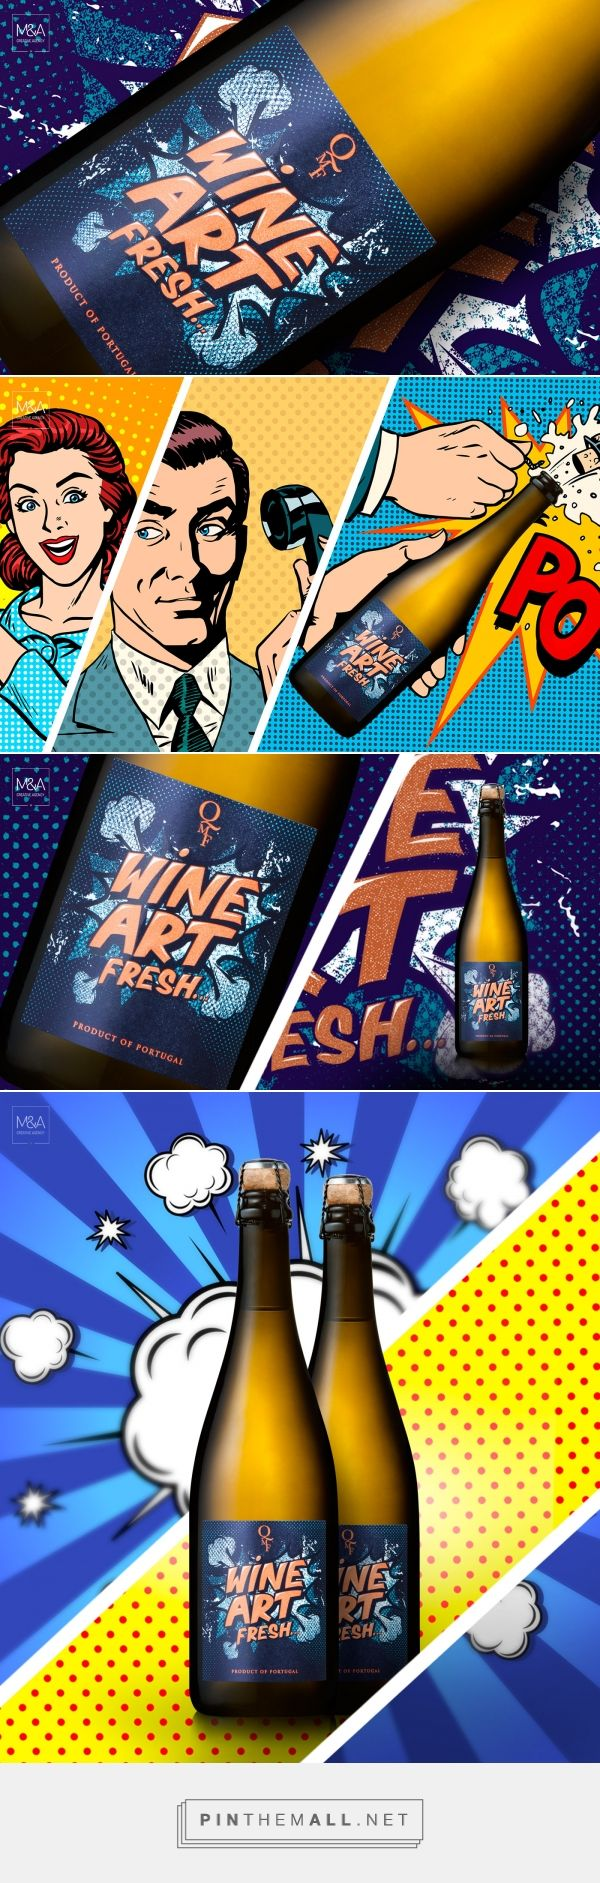 Wine Art - Packaging of the World - Creative Package Design Gallery - http://www.packagingoftheworld.com/2017/03/wine-art.html